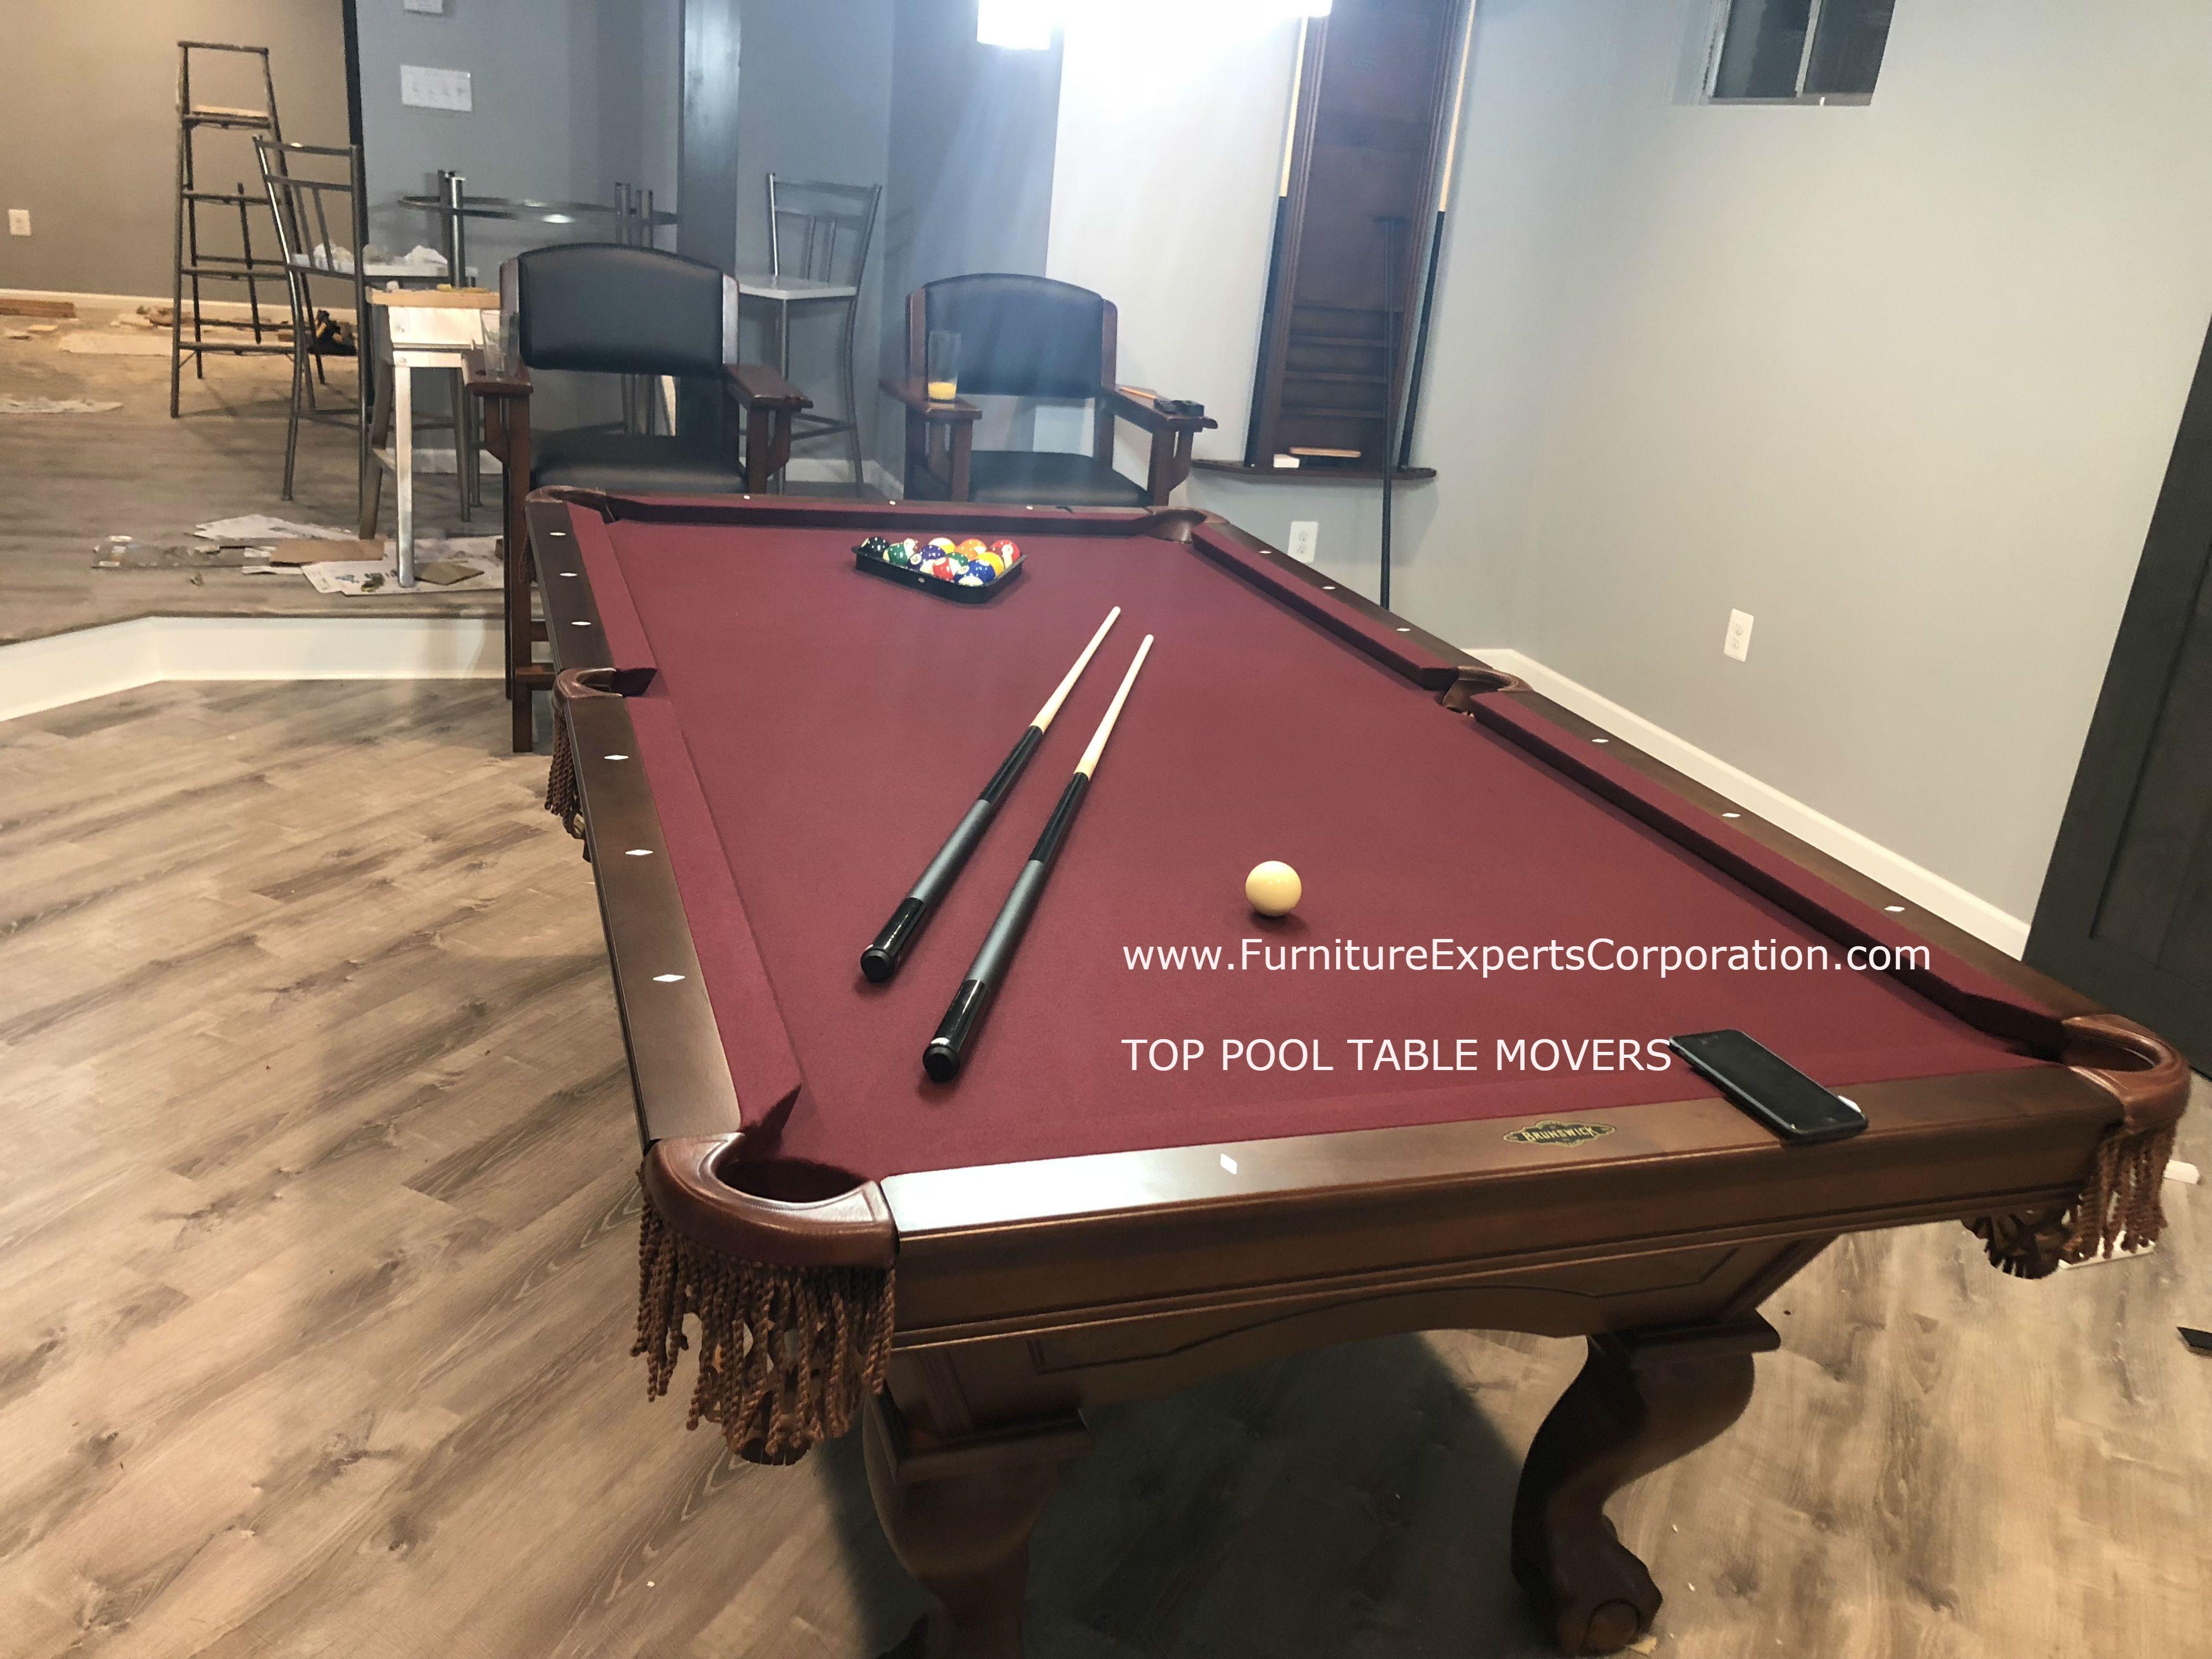 TOP POOL TABLE INSTALLERS & MOVERS Brunswick billiards